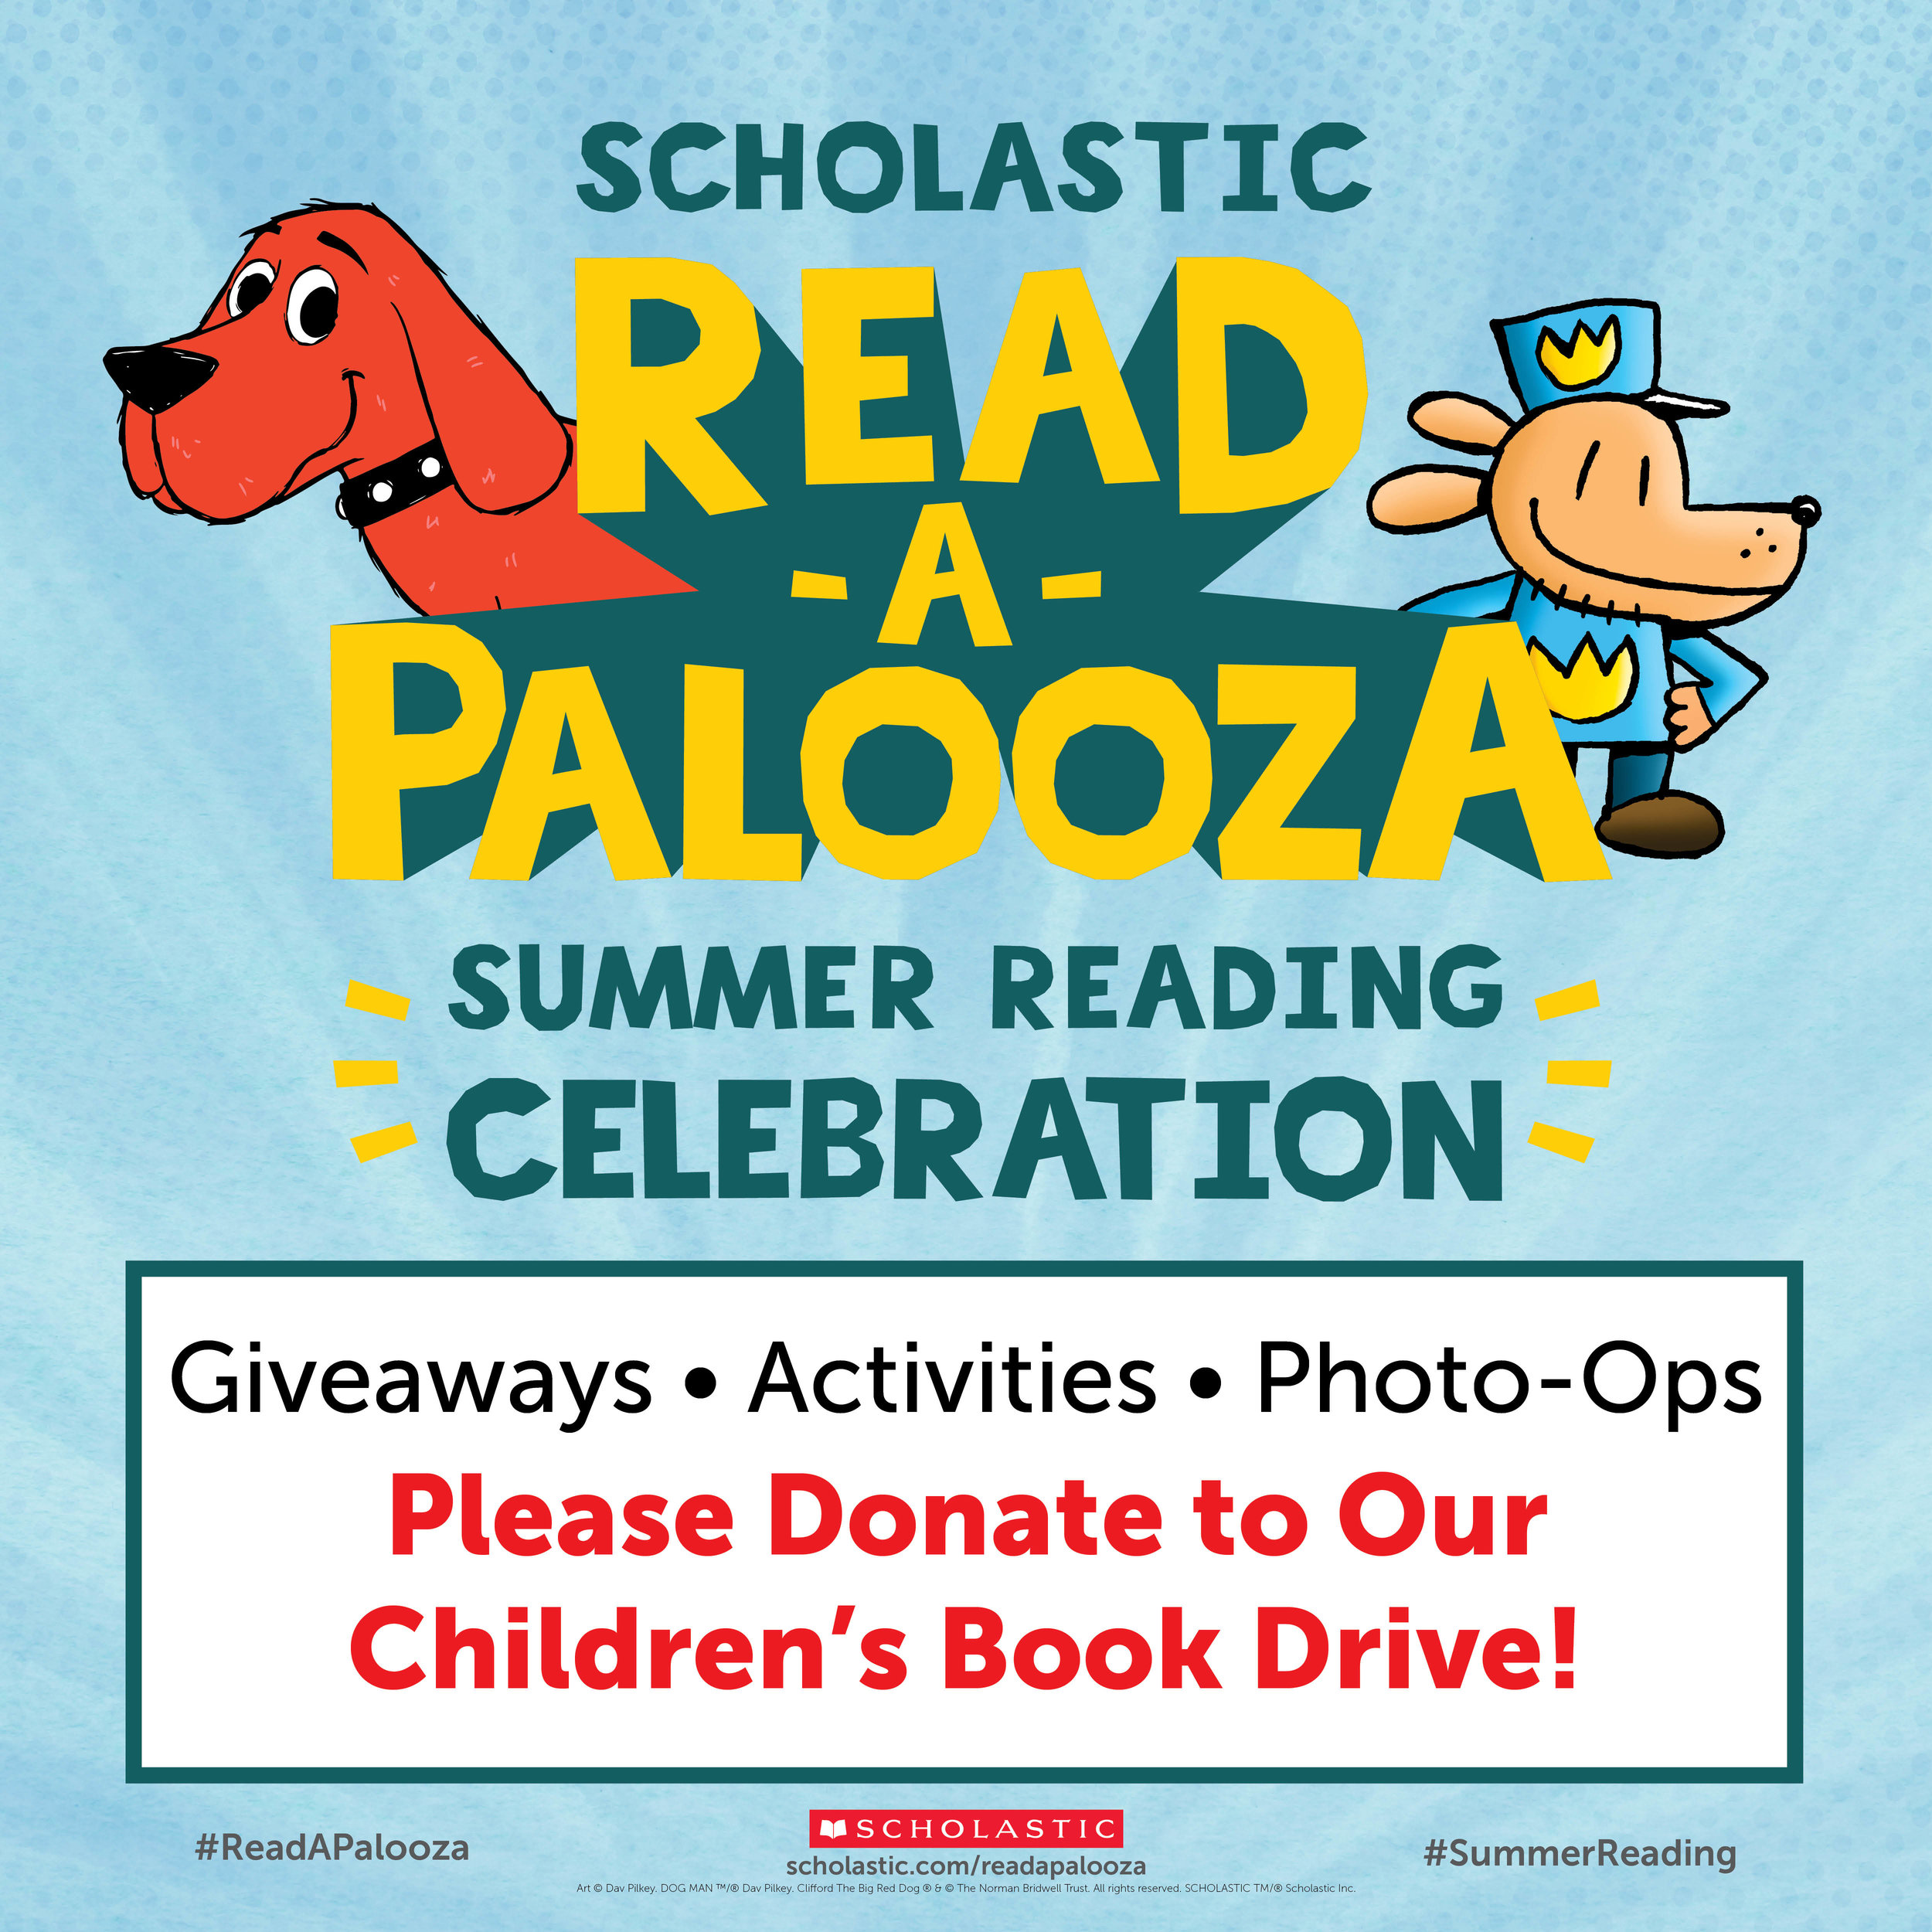 Scholastic Read-a-Palooza Square Social Image.jpg